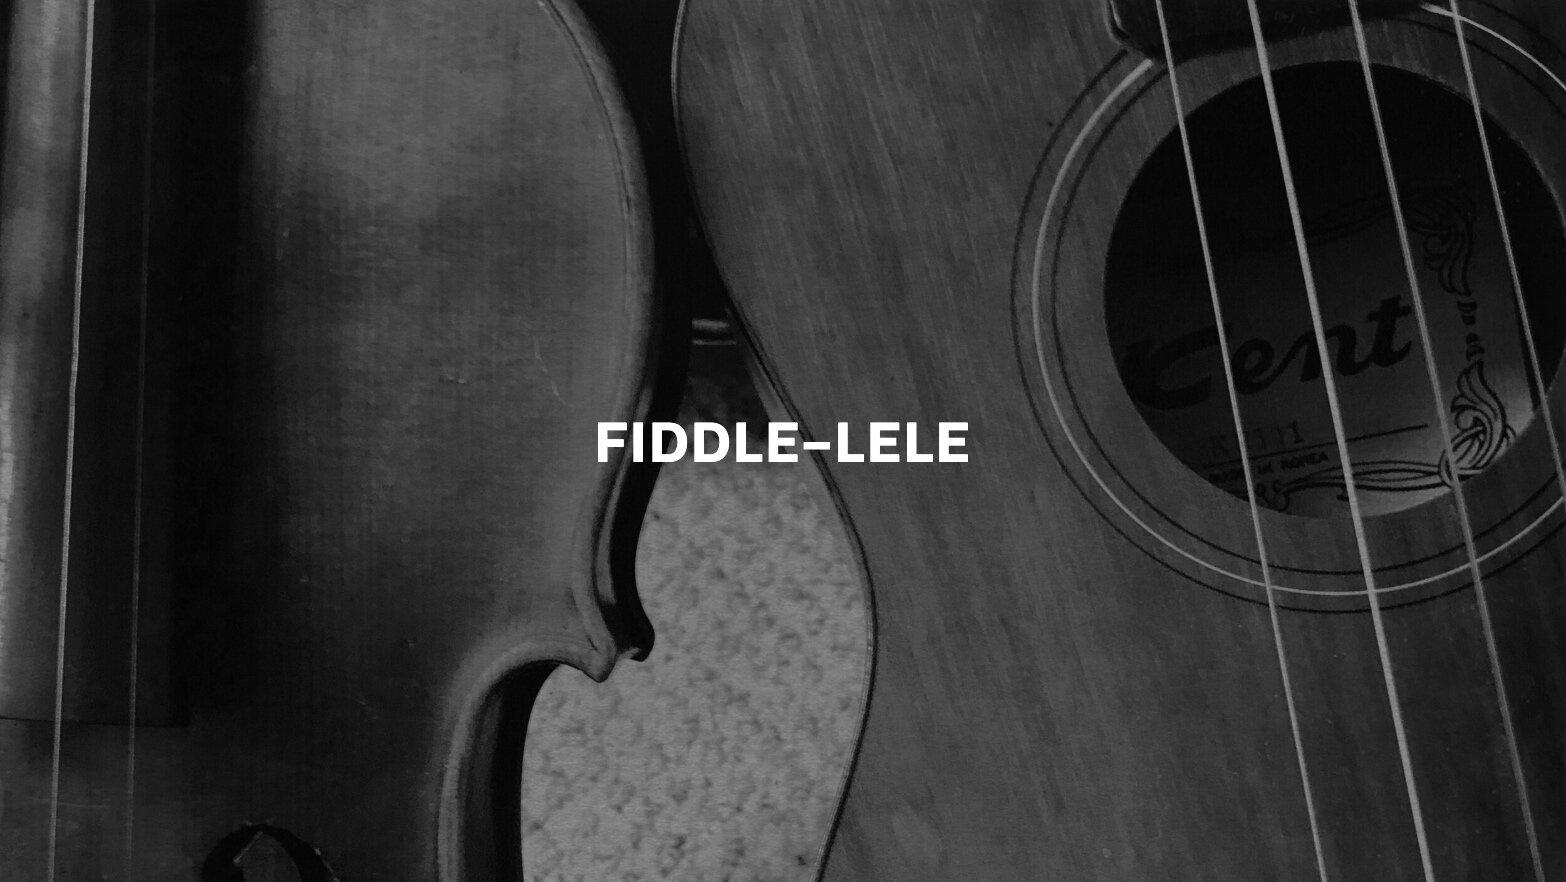 Fiddle-lele Text.jpg